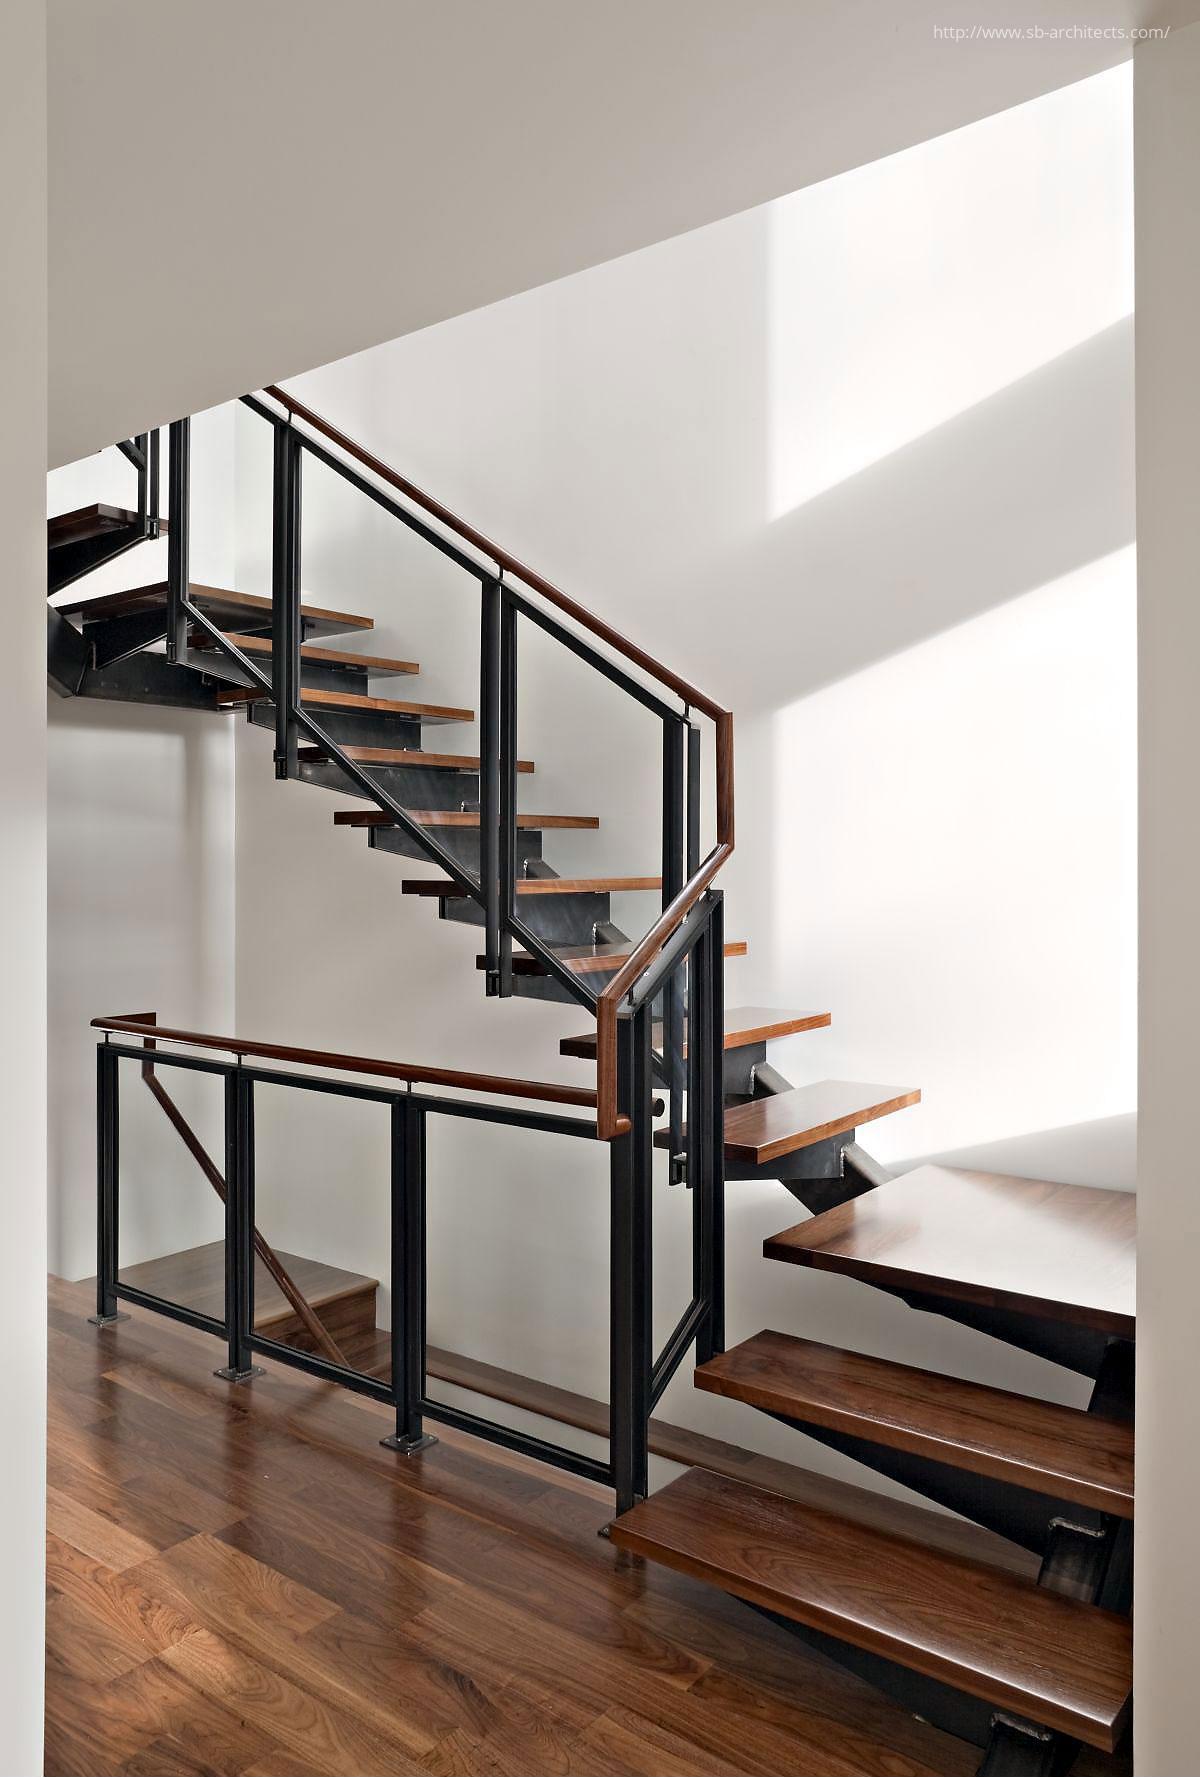 Beltéri lépcső // HOMEINFO.hu - Inspirációtár